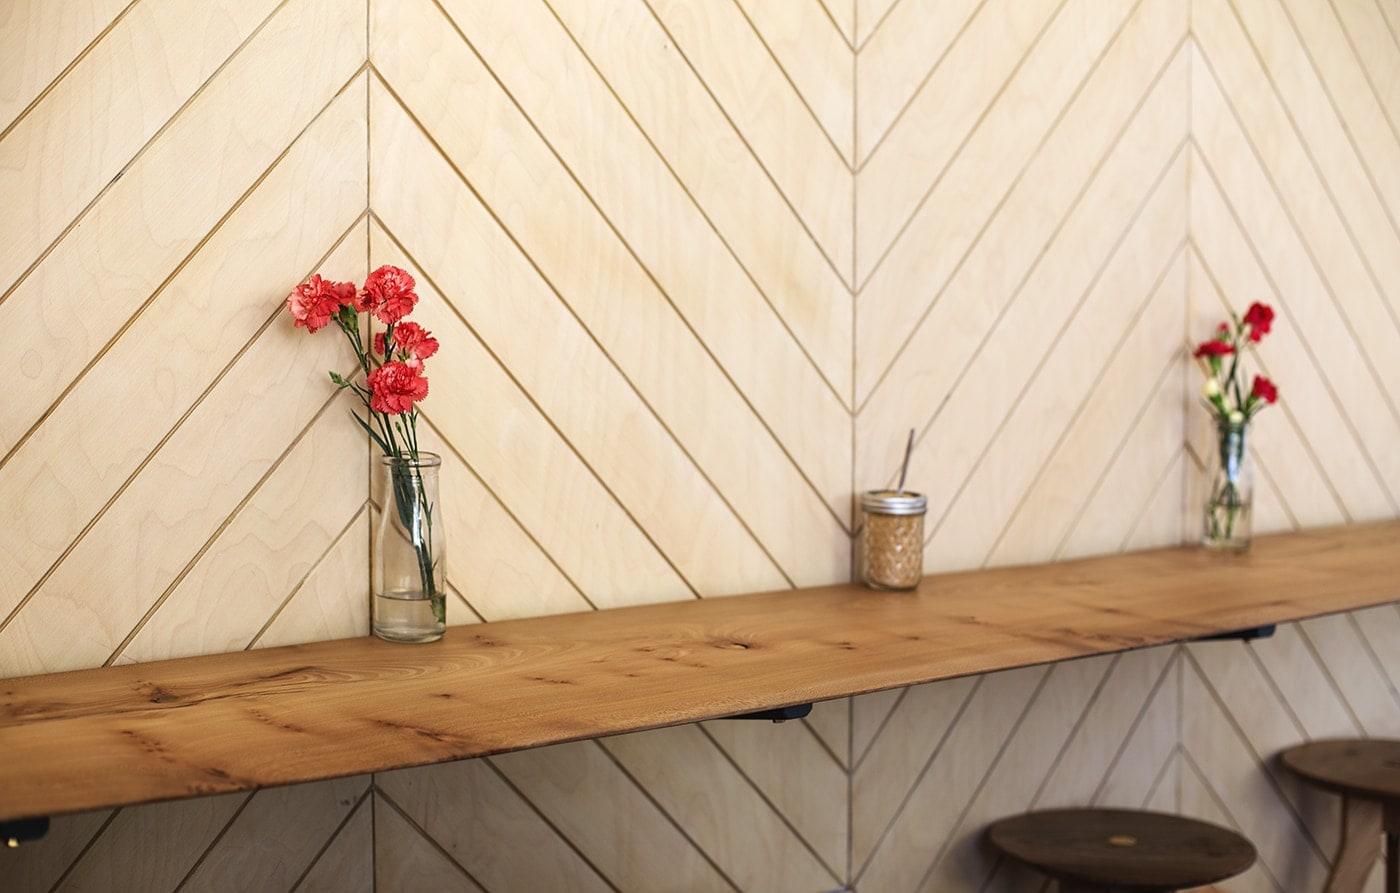 Clapham staycation | Story Coffee interiors 4 | mini break